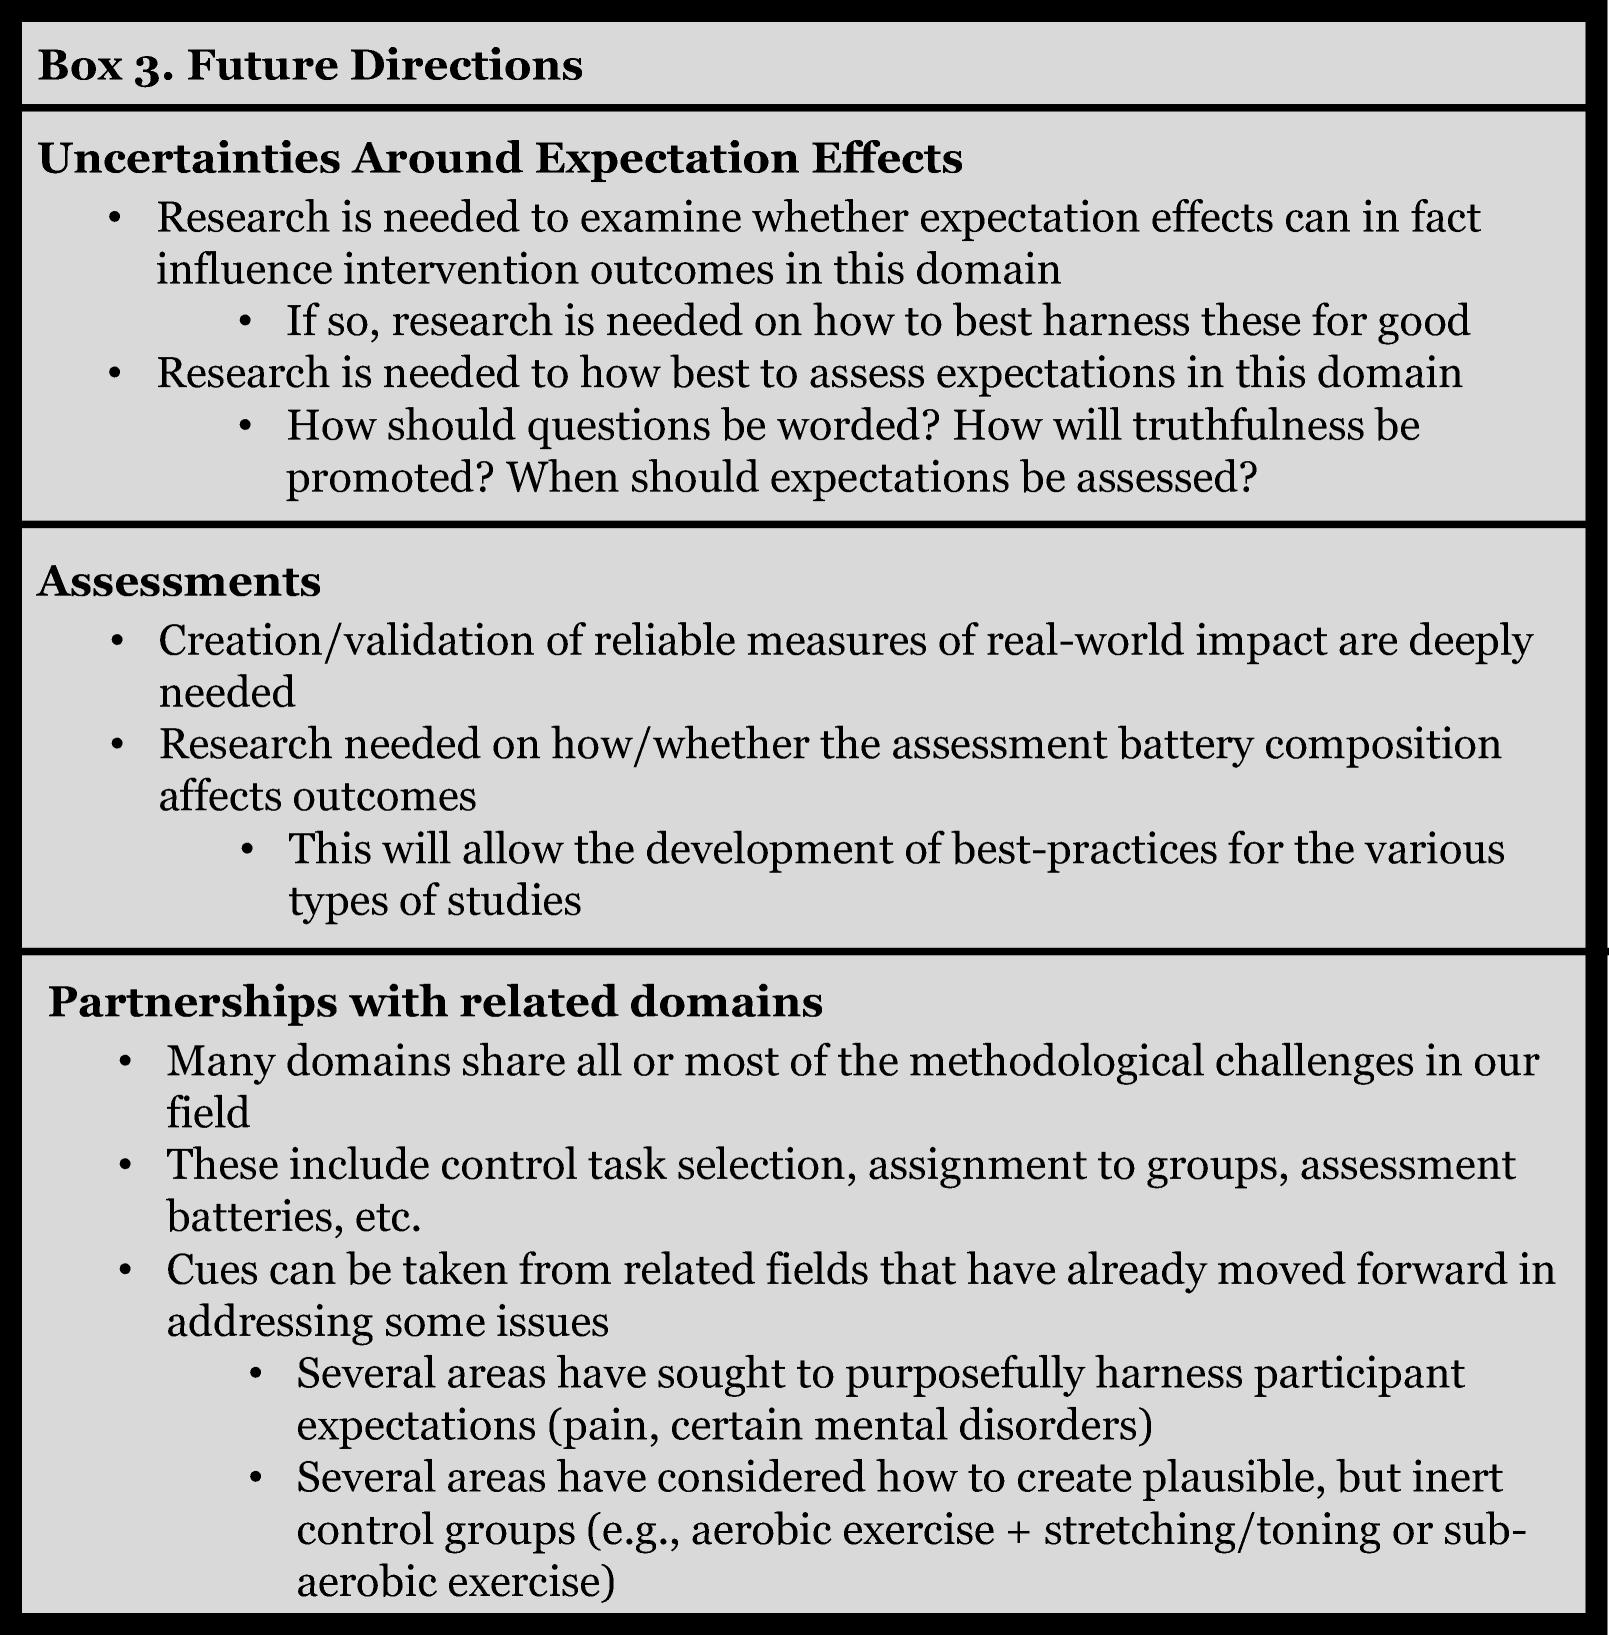 Improving Methodological Standards in Behavioral Interventions for